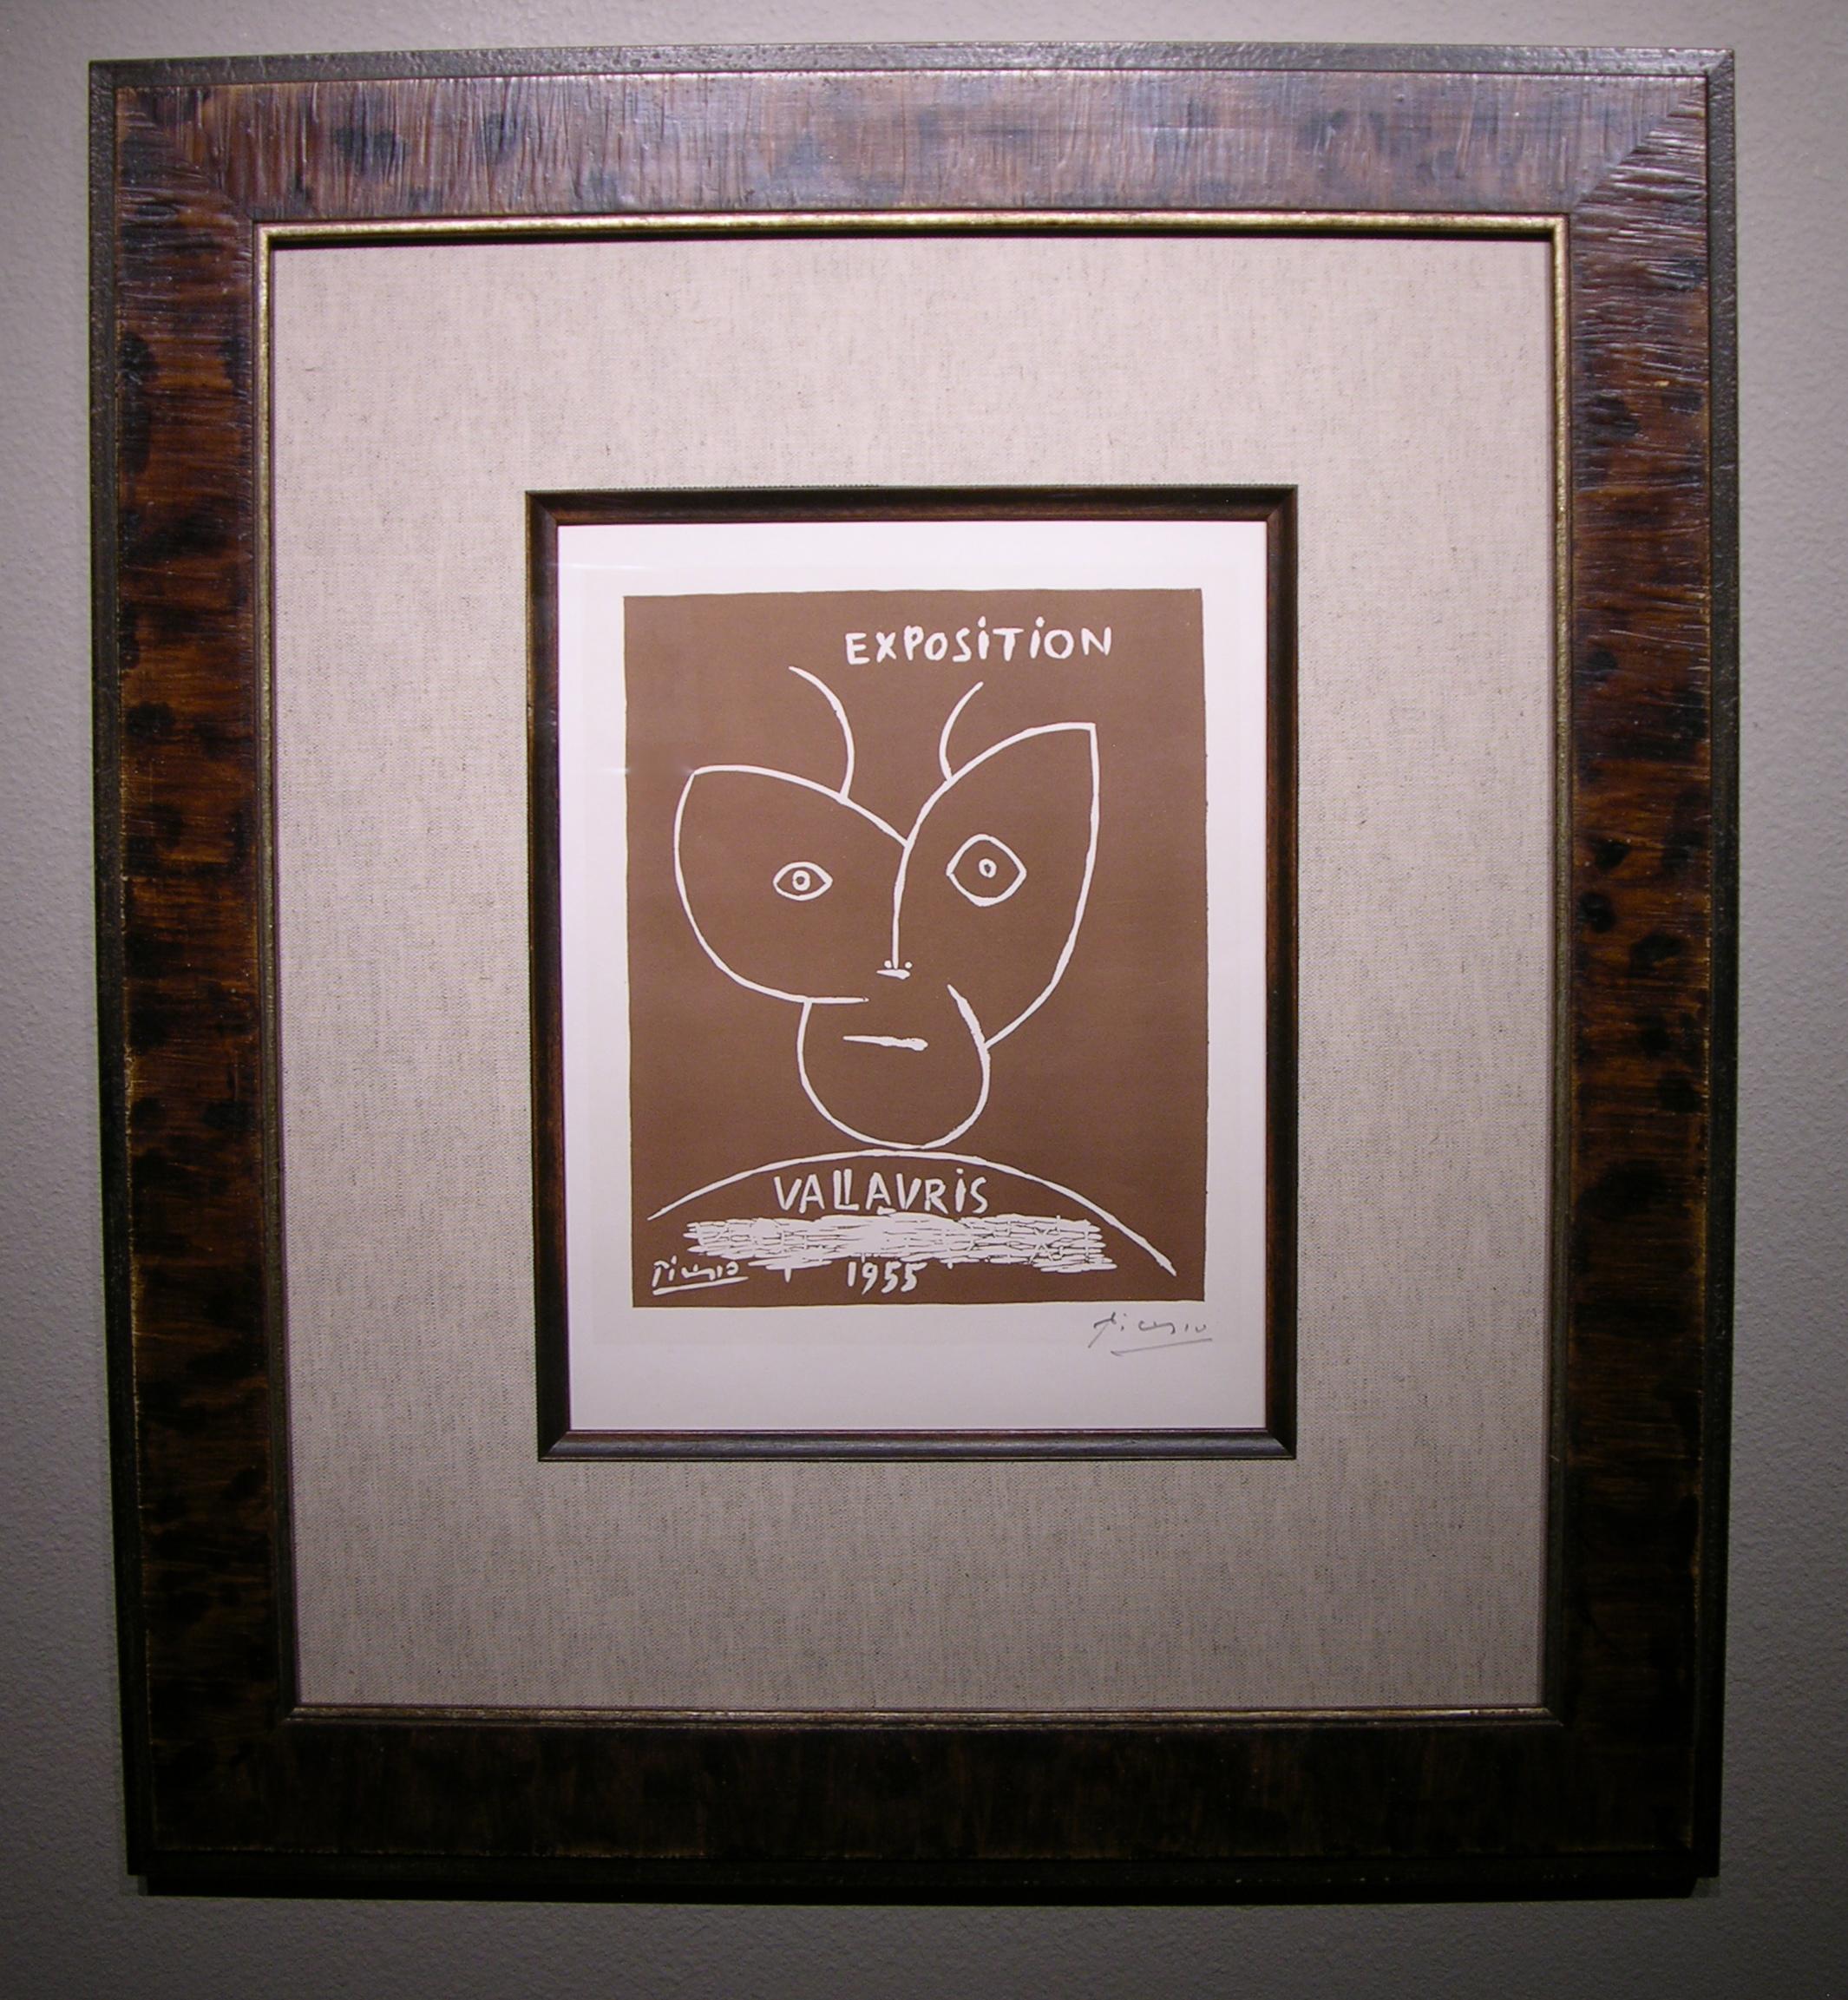 Picasso Vallauris Lino-Cut